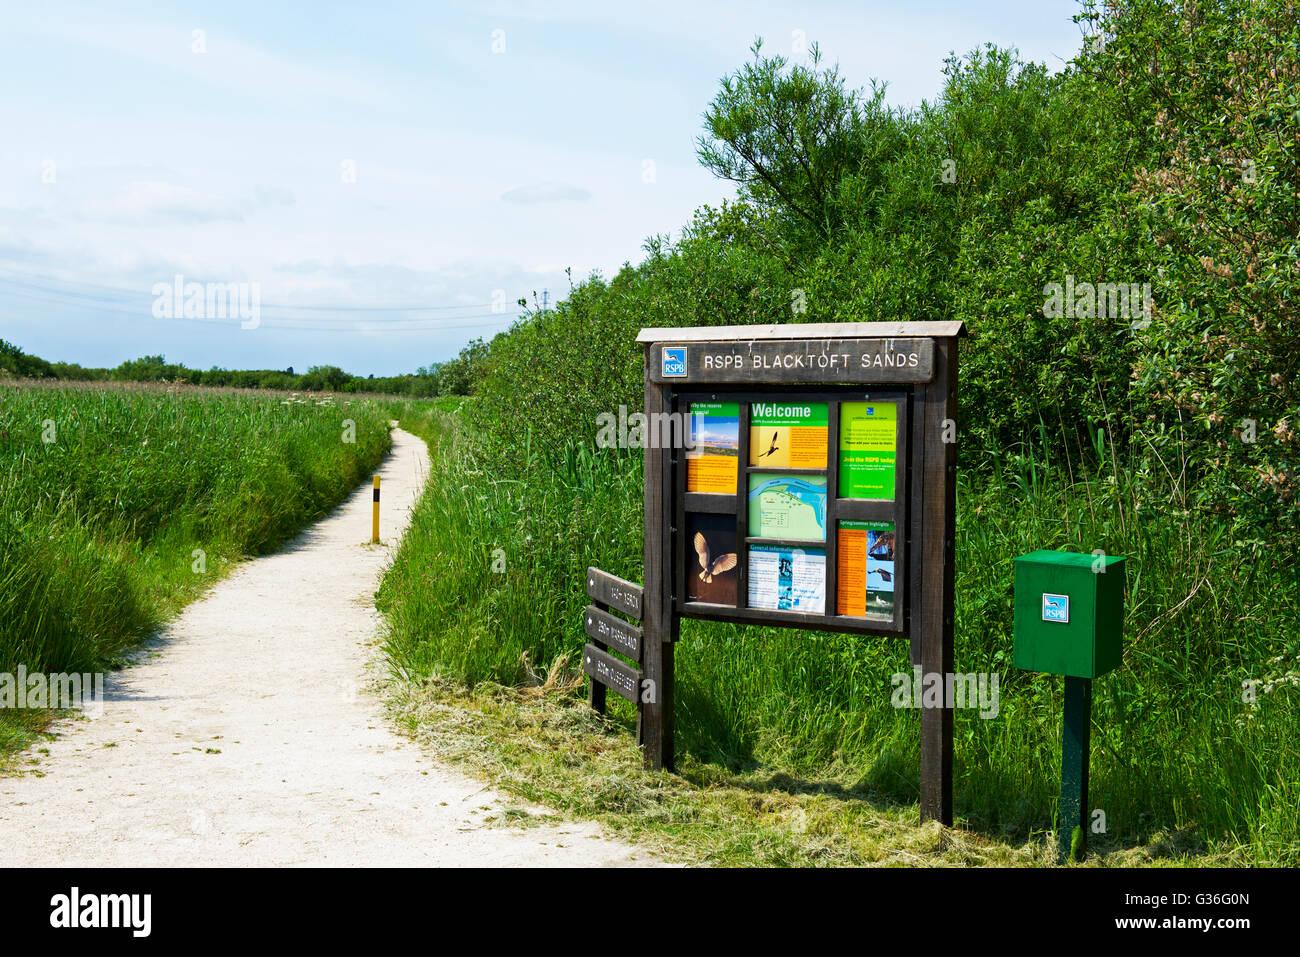 Blacktoft Sands, an RSPB reserve, East Yorkshire, England UK - Stock Image